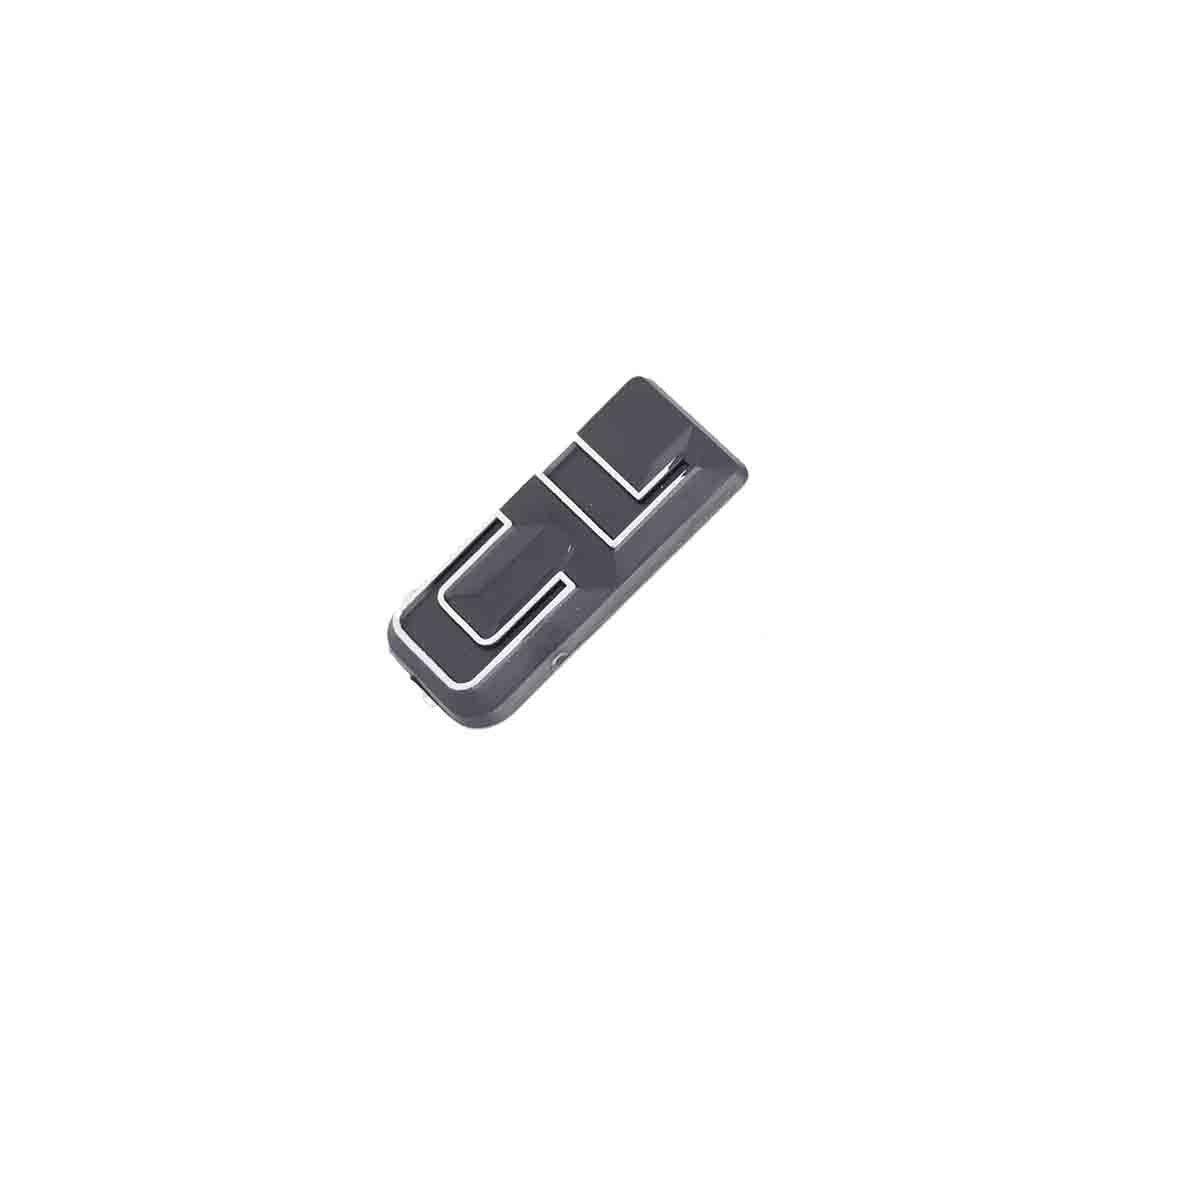 Emblema CL Santana 85/90